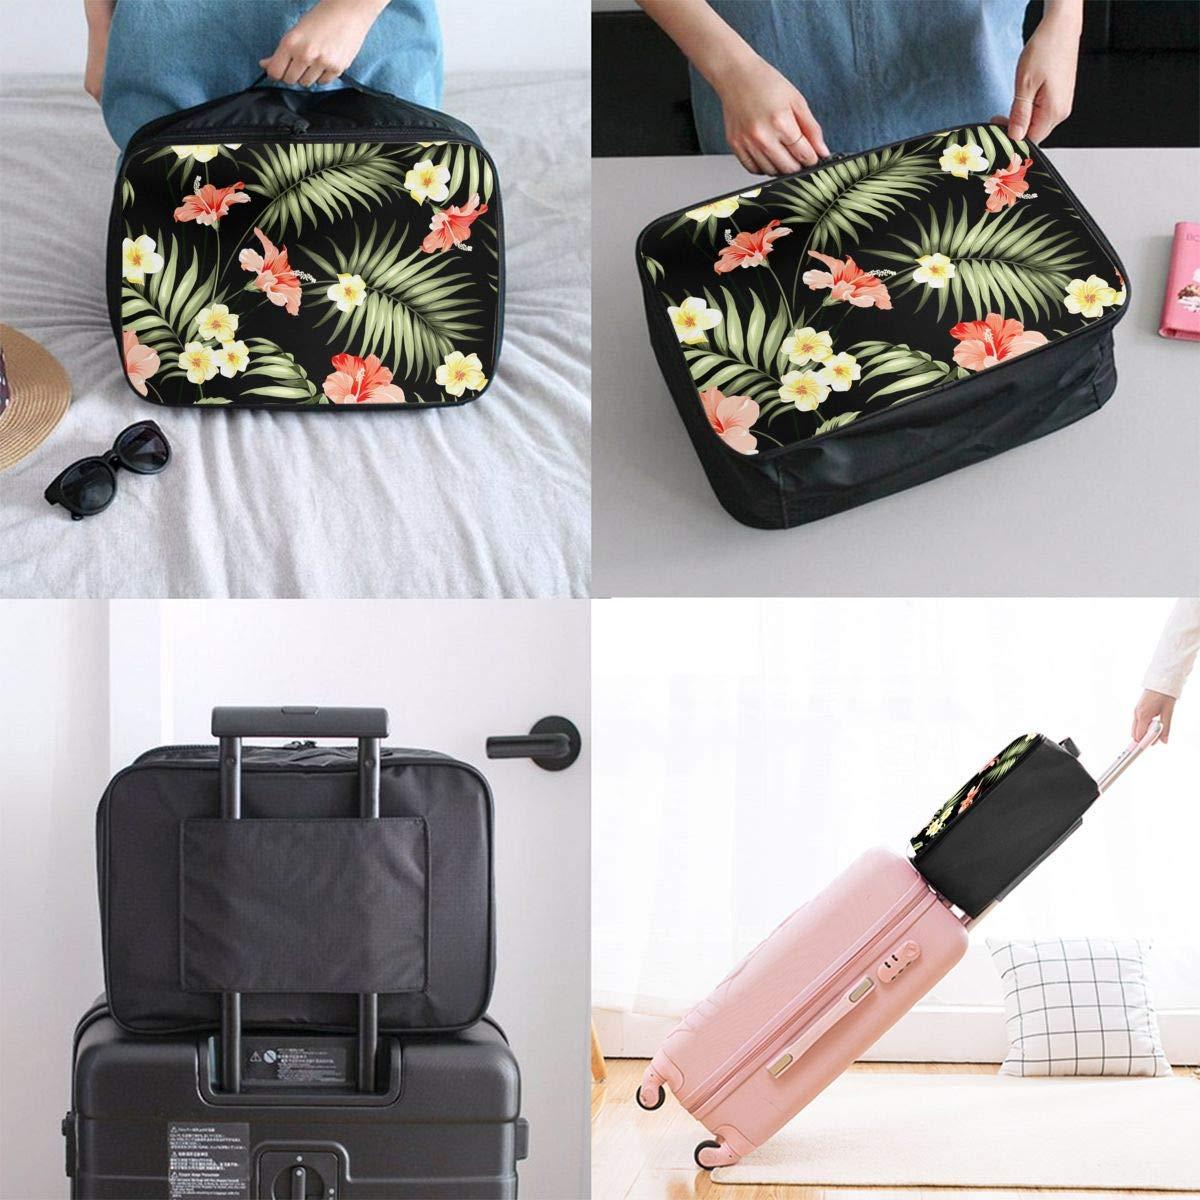 Travel Lightweight Waterproof Foldable Storage Carry Luggage Duffle Tote Bag Happy Halloween Purple Pumpkin